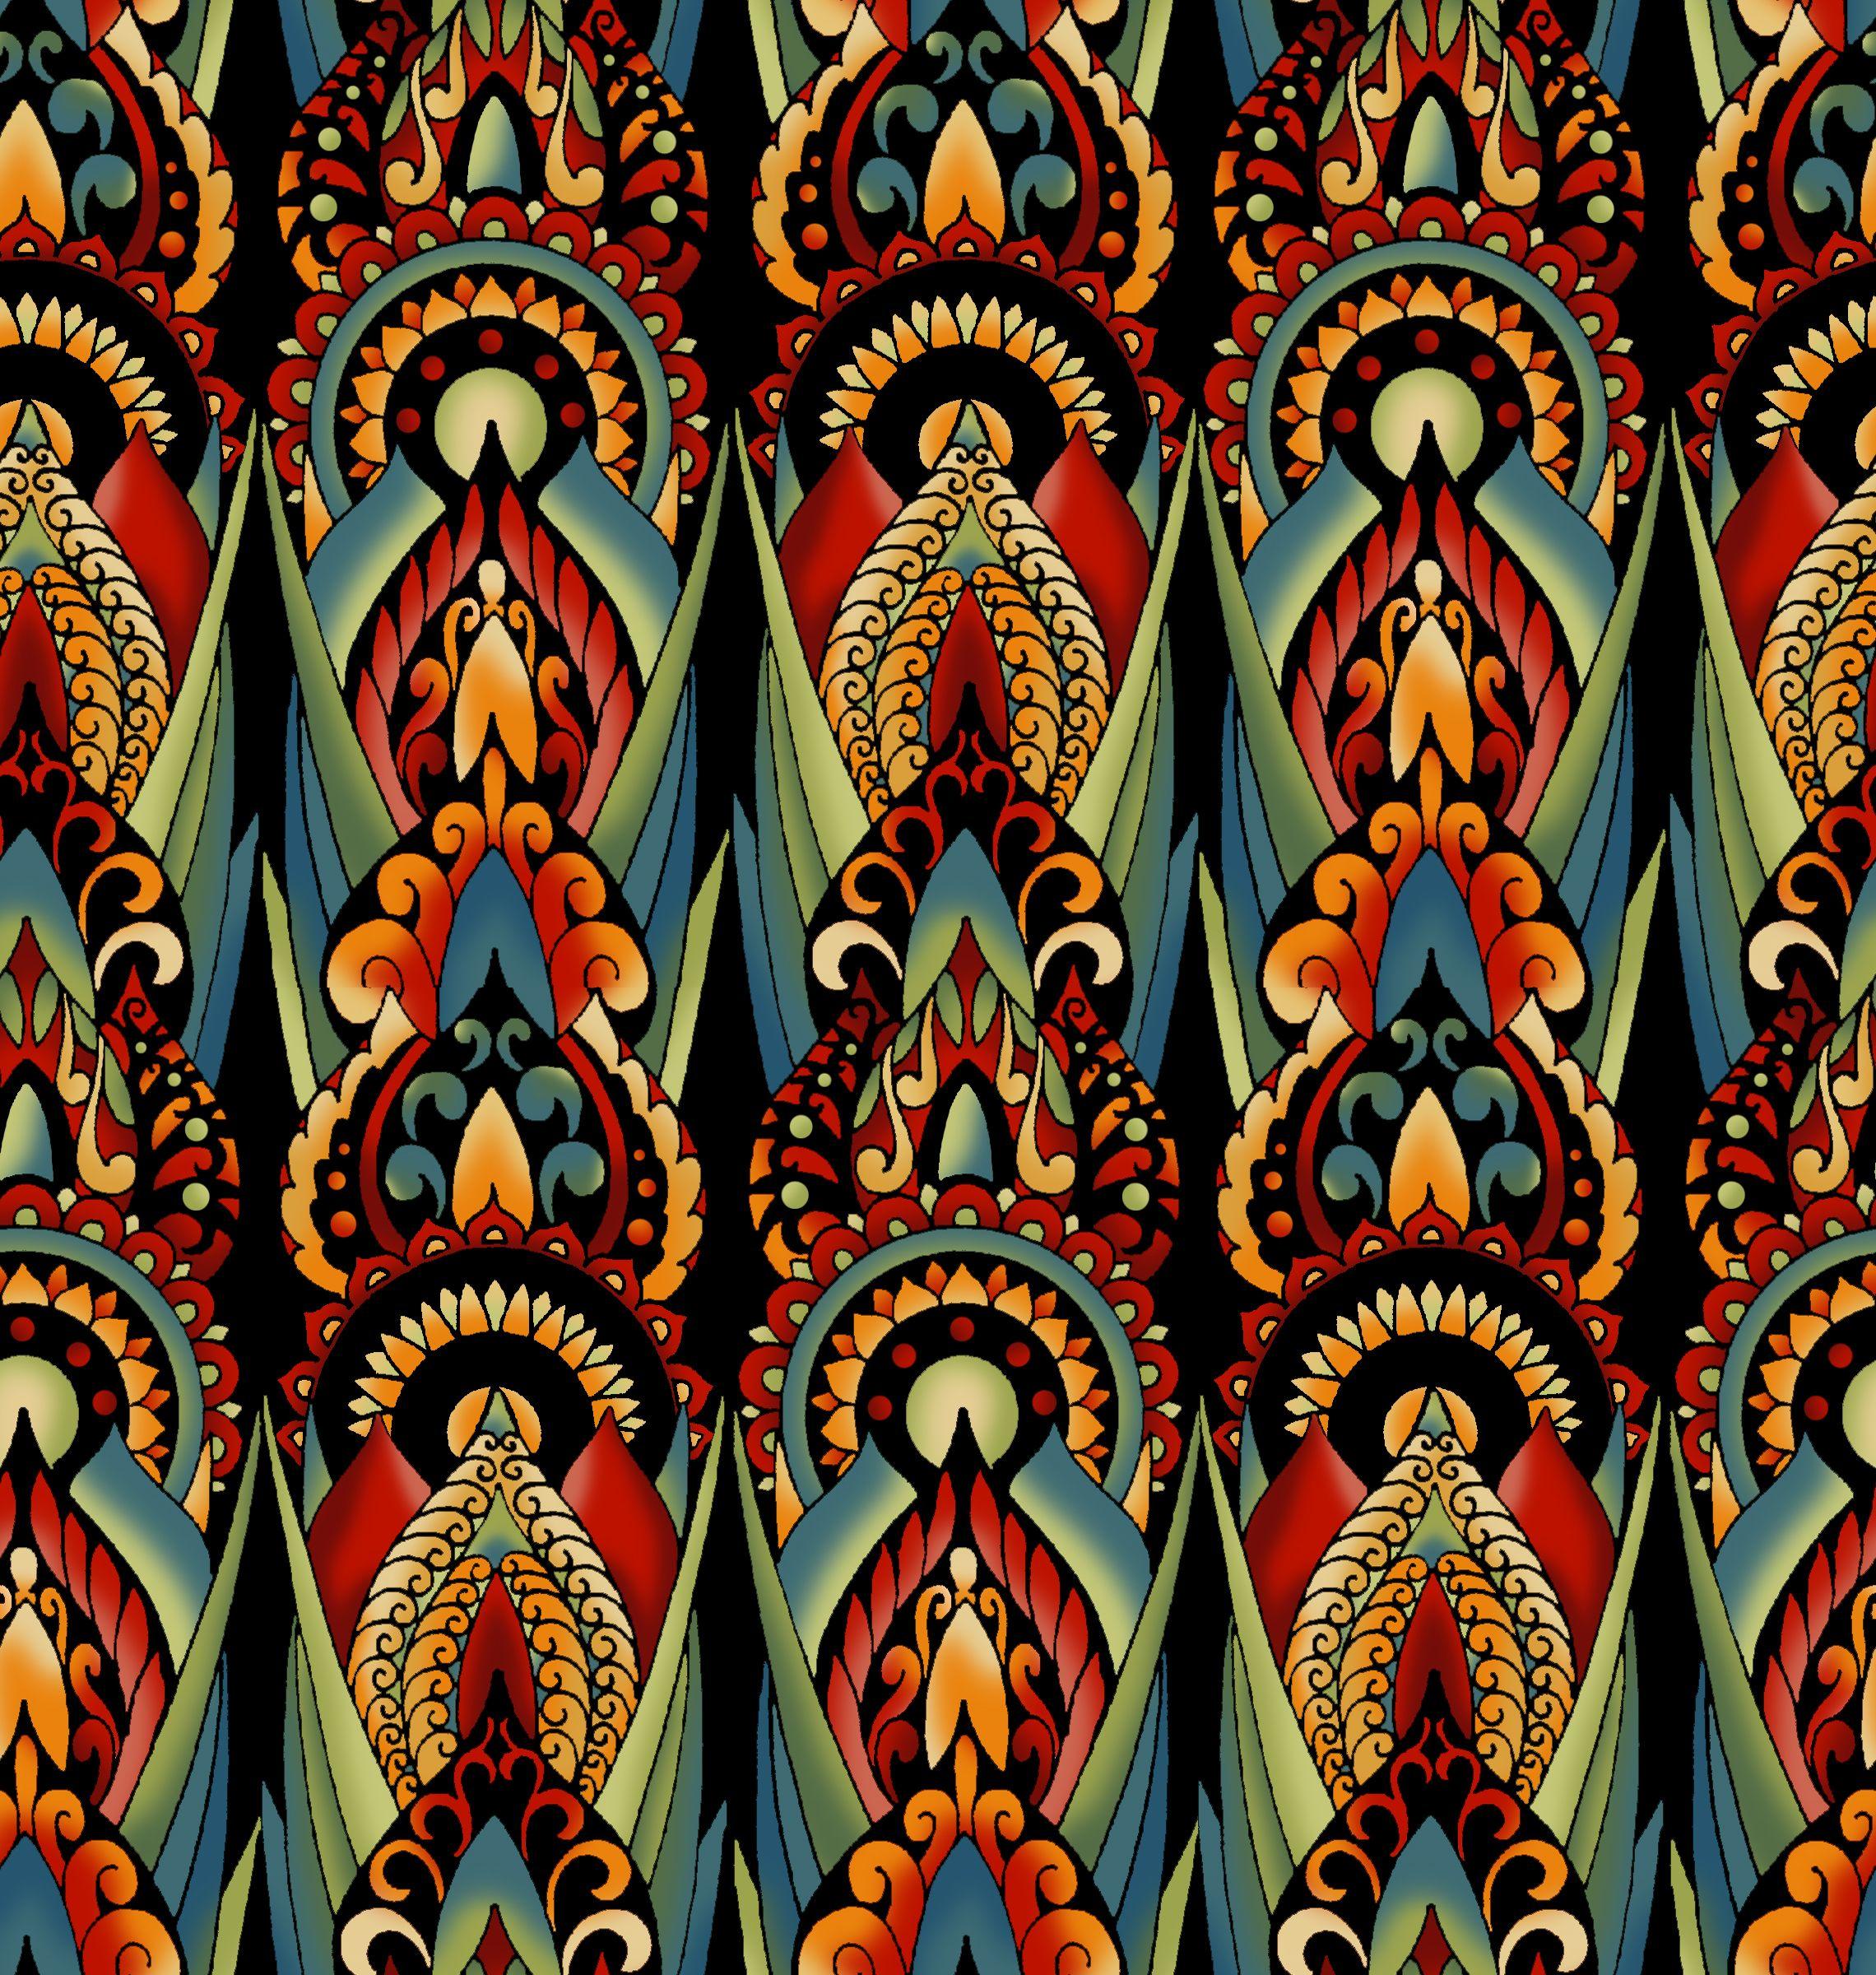 Art deco fall inspiring md design pinterest art for Art deco fabric